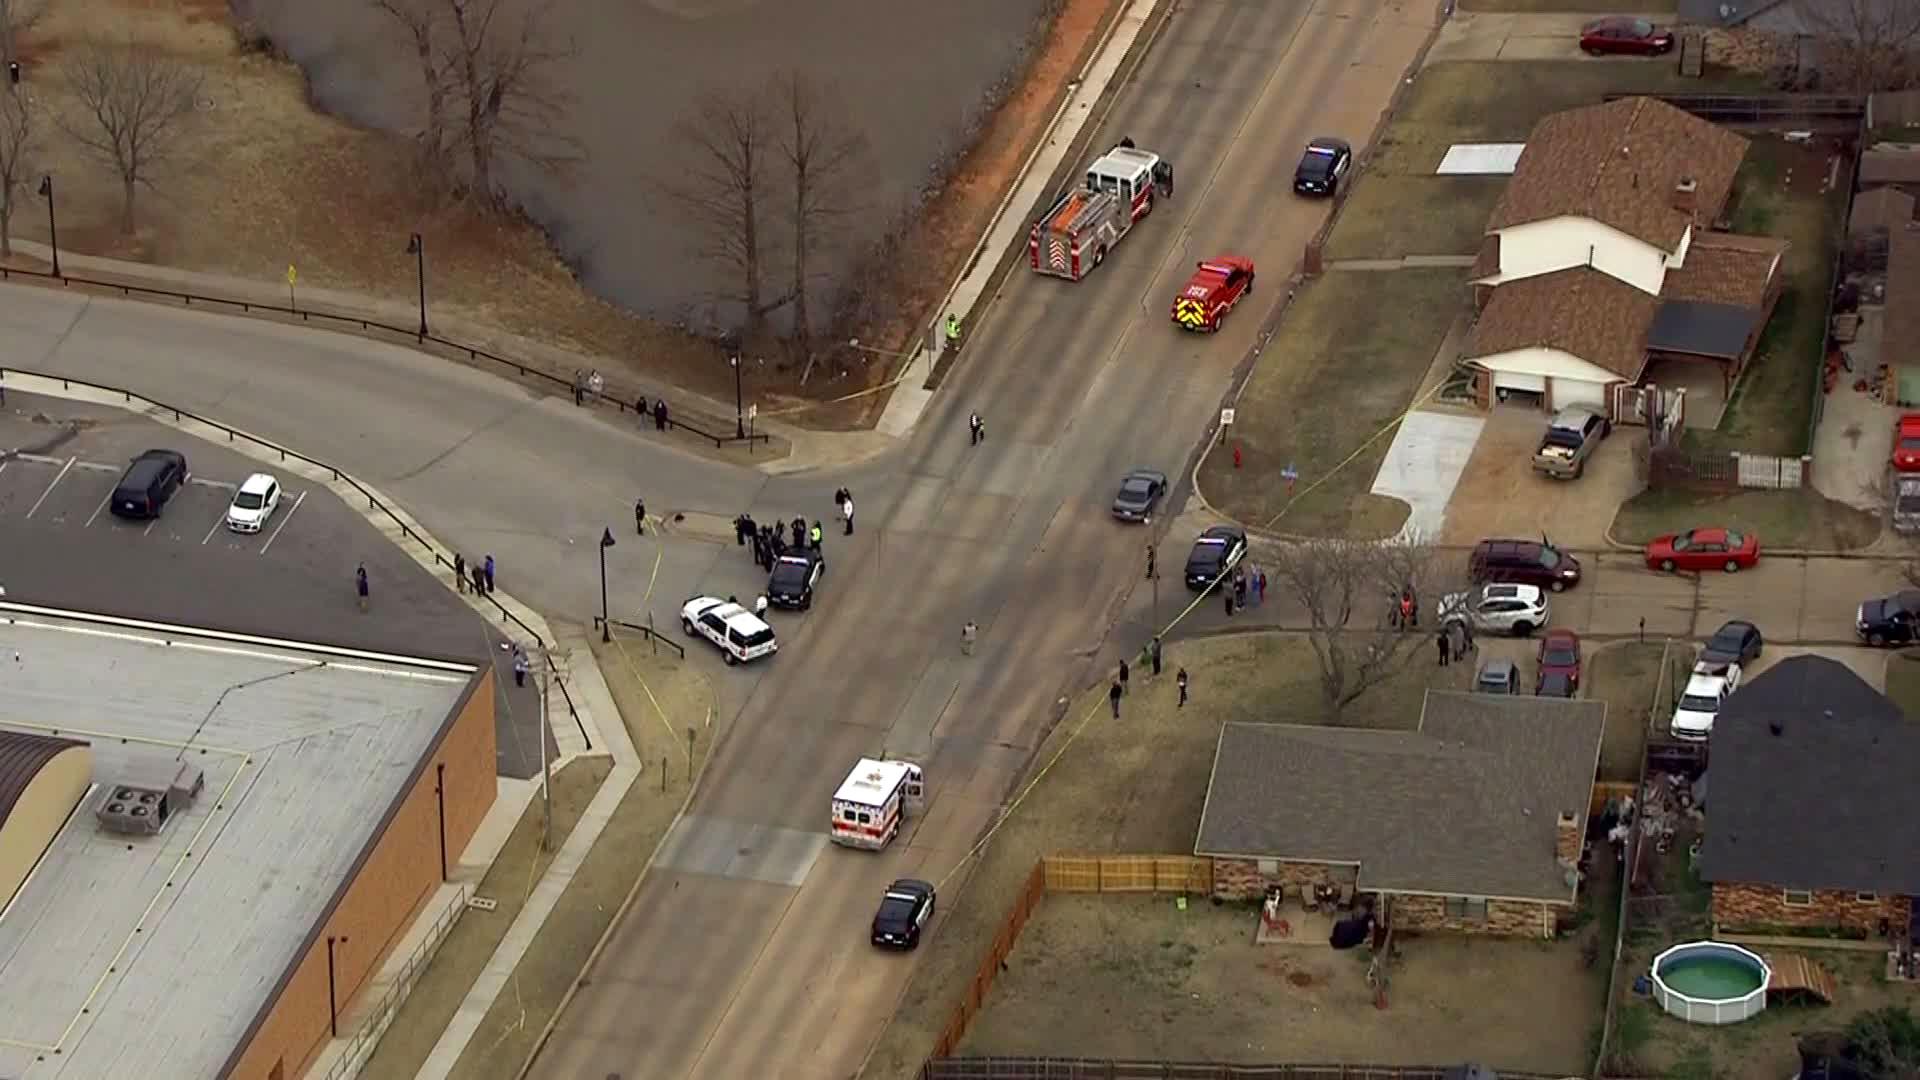 Third runner dies after a truck hit members of an Oklahoma high school track team